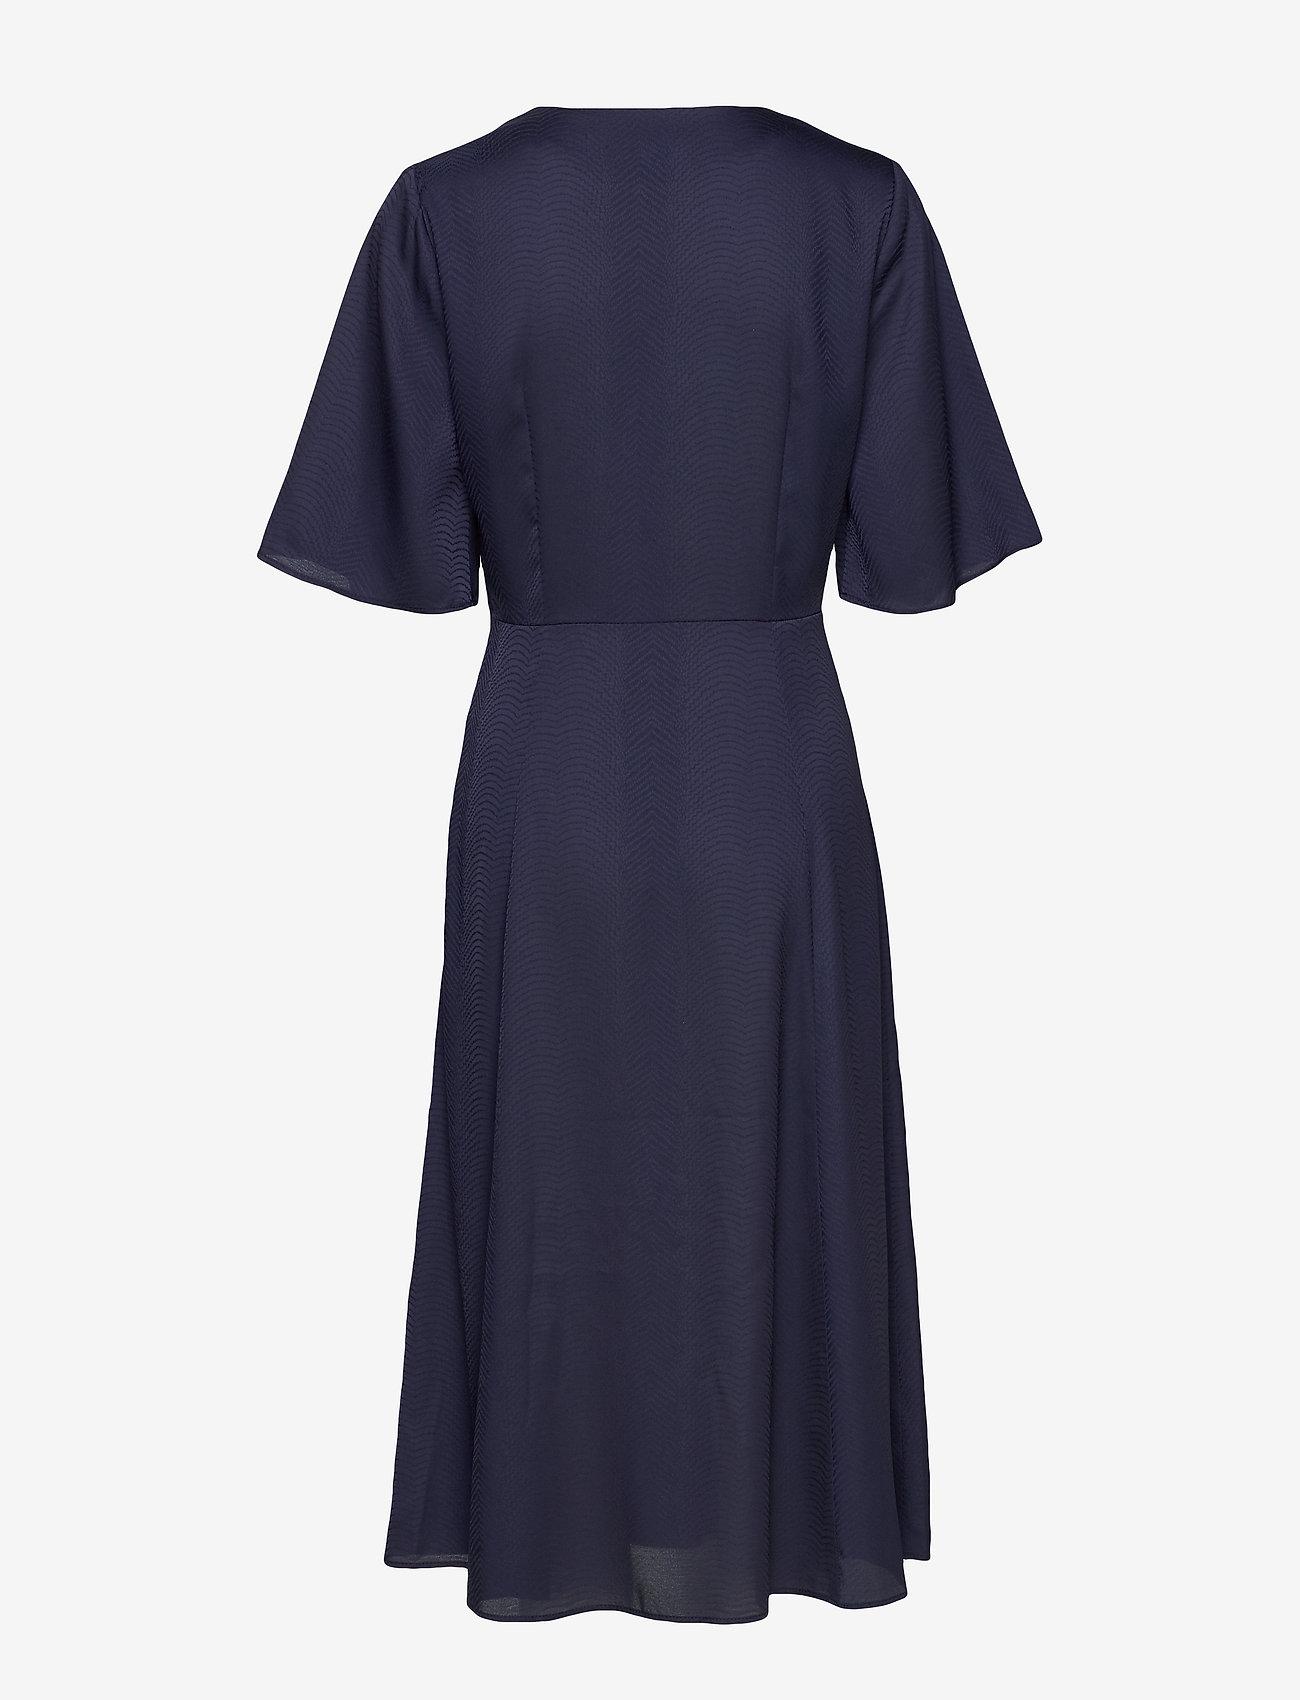 2NDDAY - 2ND Carly - midi kjoler - blue night - 1